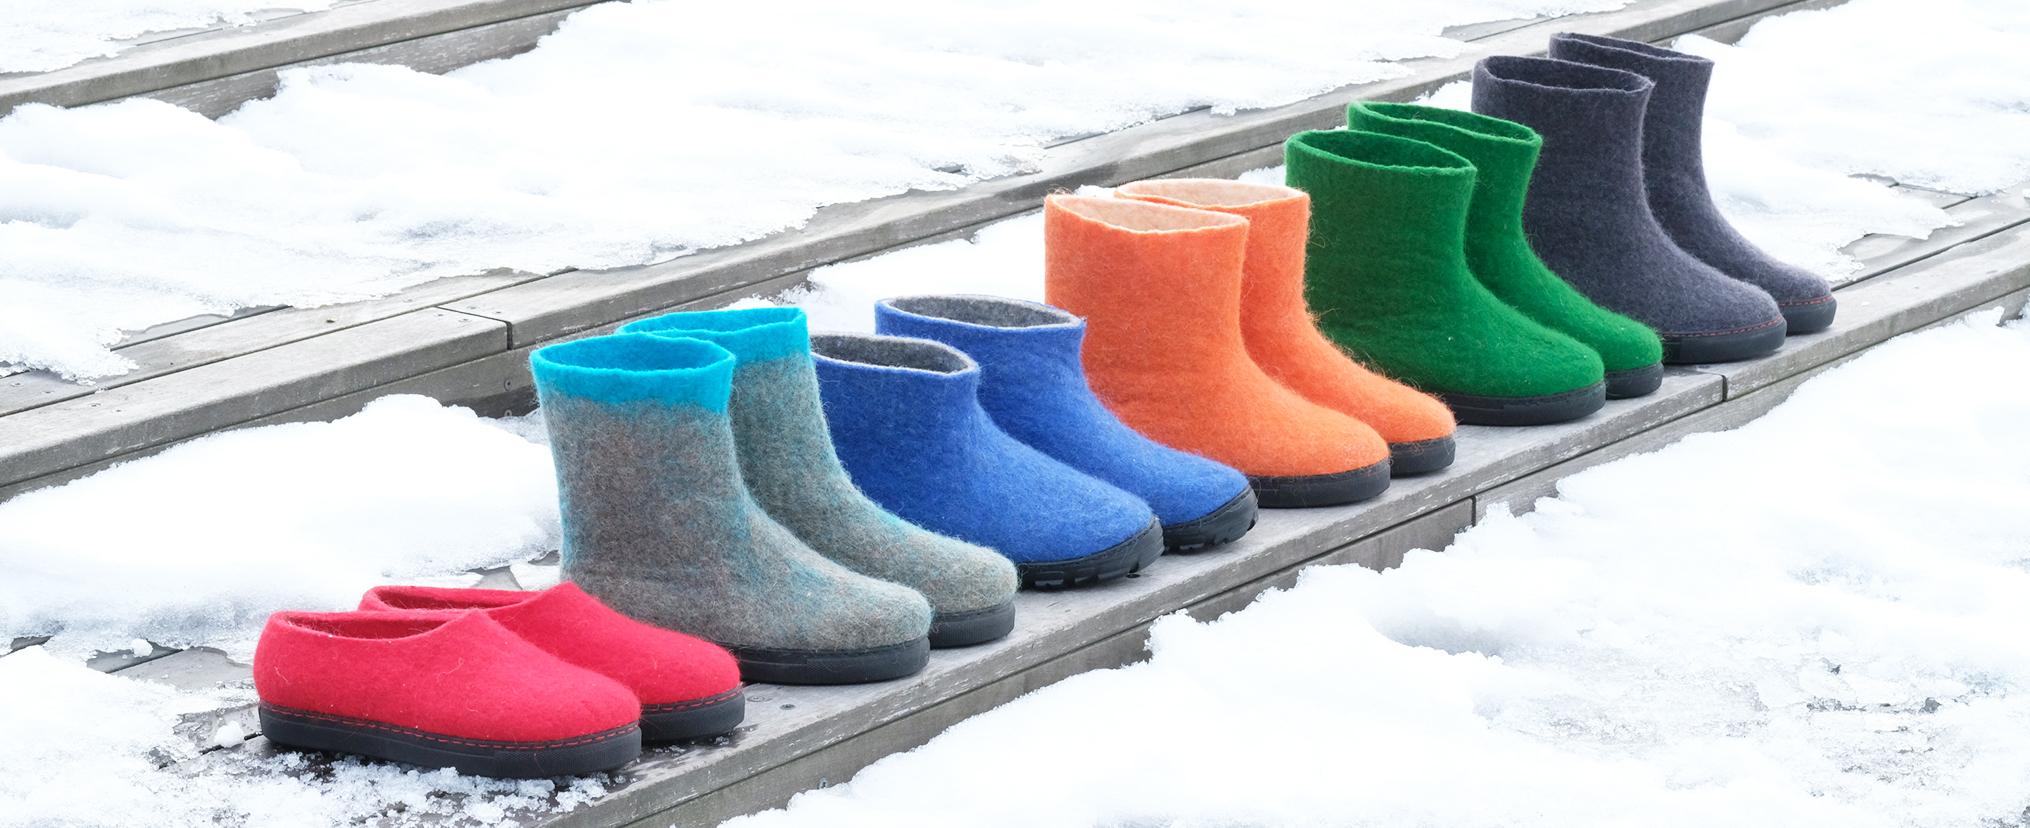 Handmade Wool Boots and Felt Shoes House Shoes - FELT FORMA